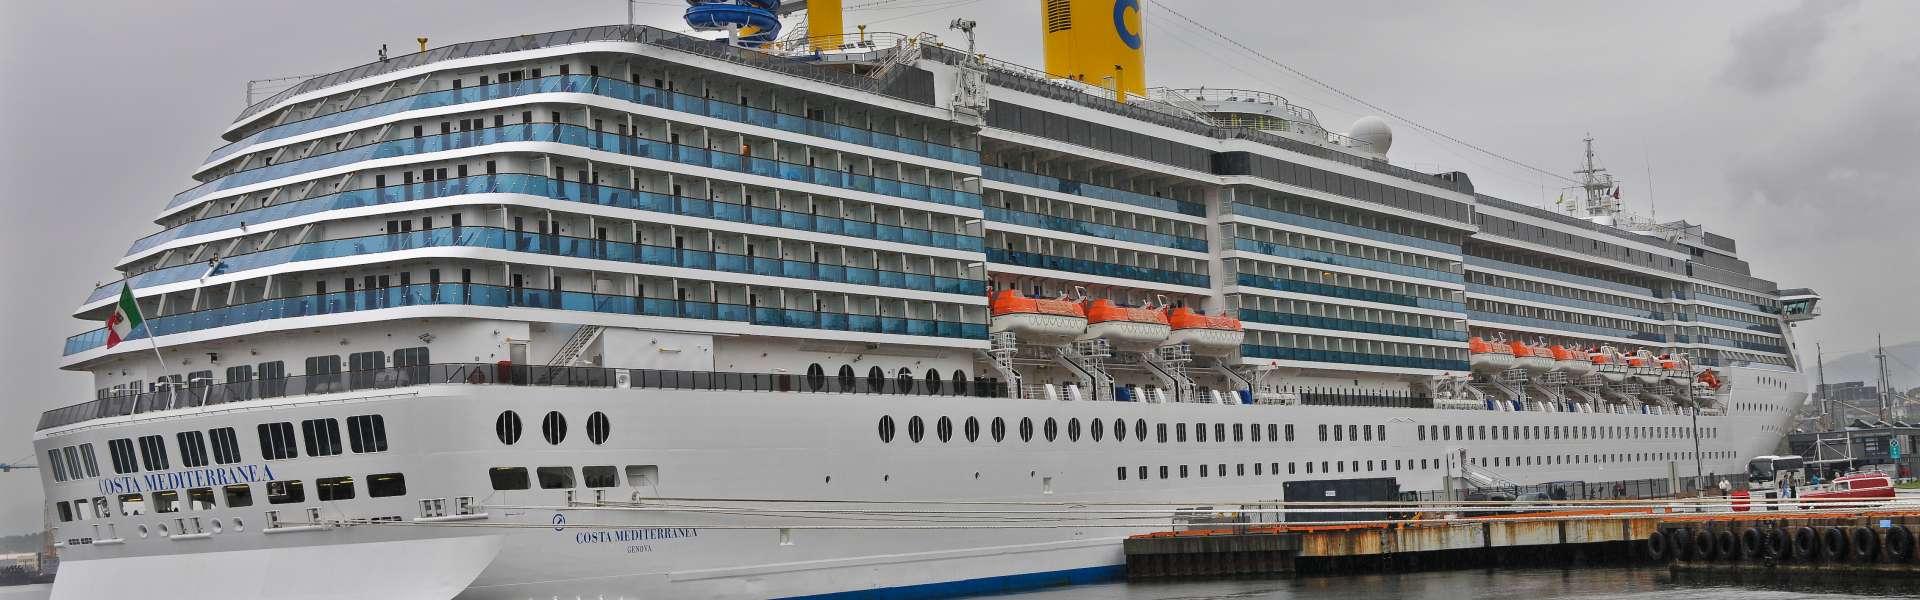 Croaziera 2018 - Emiratele Arabe Unite (Dubai) - Costa Cruises - Costa Mediterranea - 7 nopti